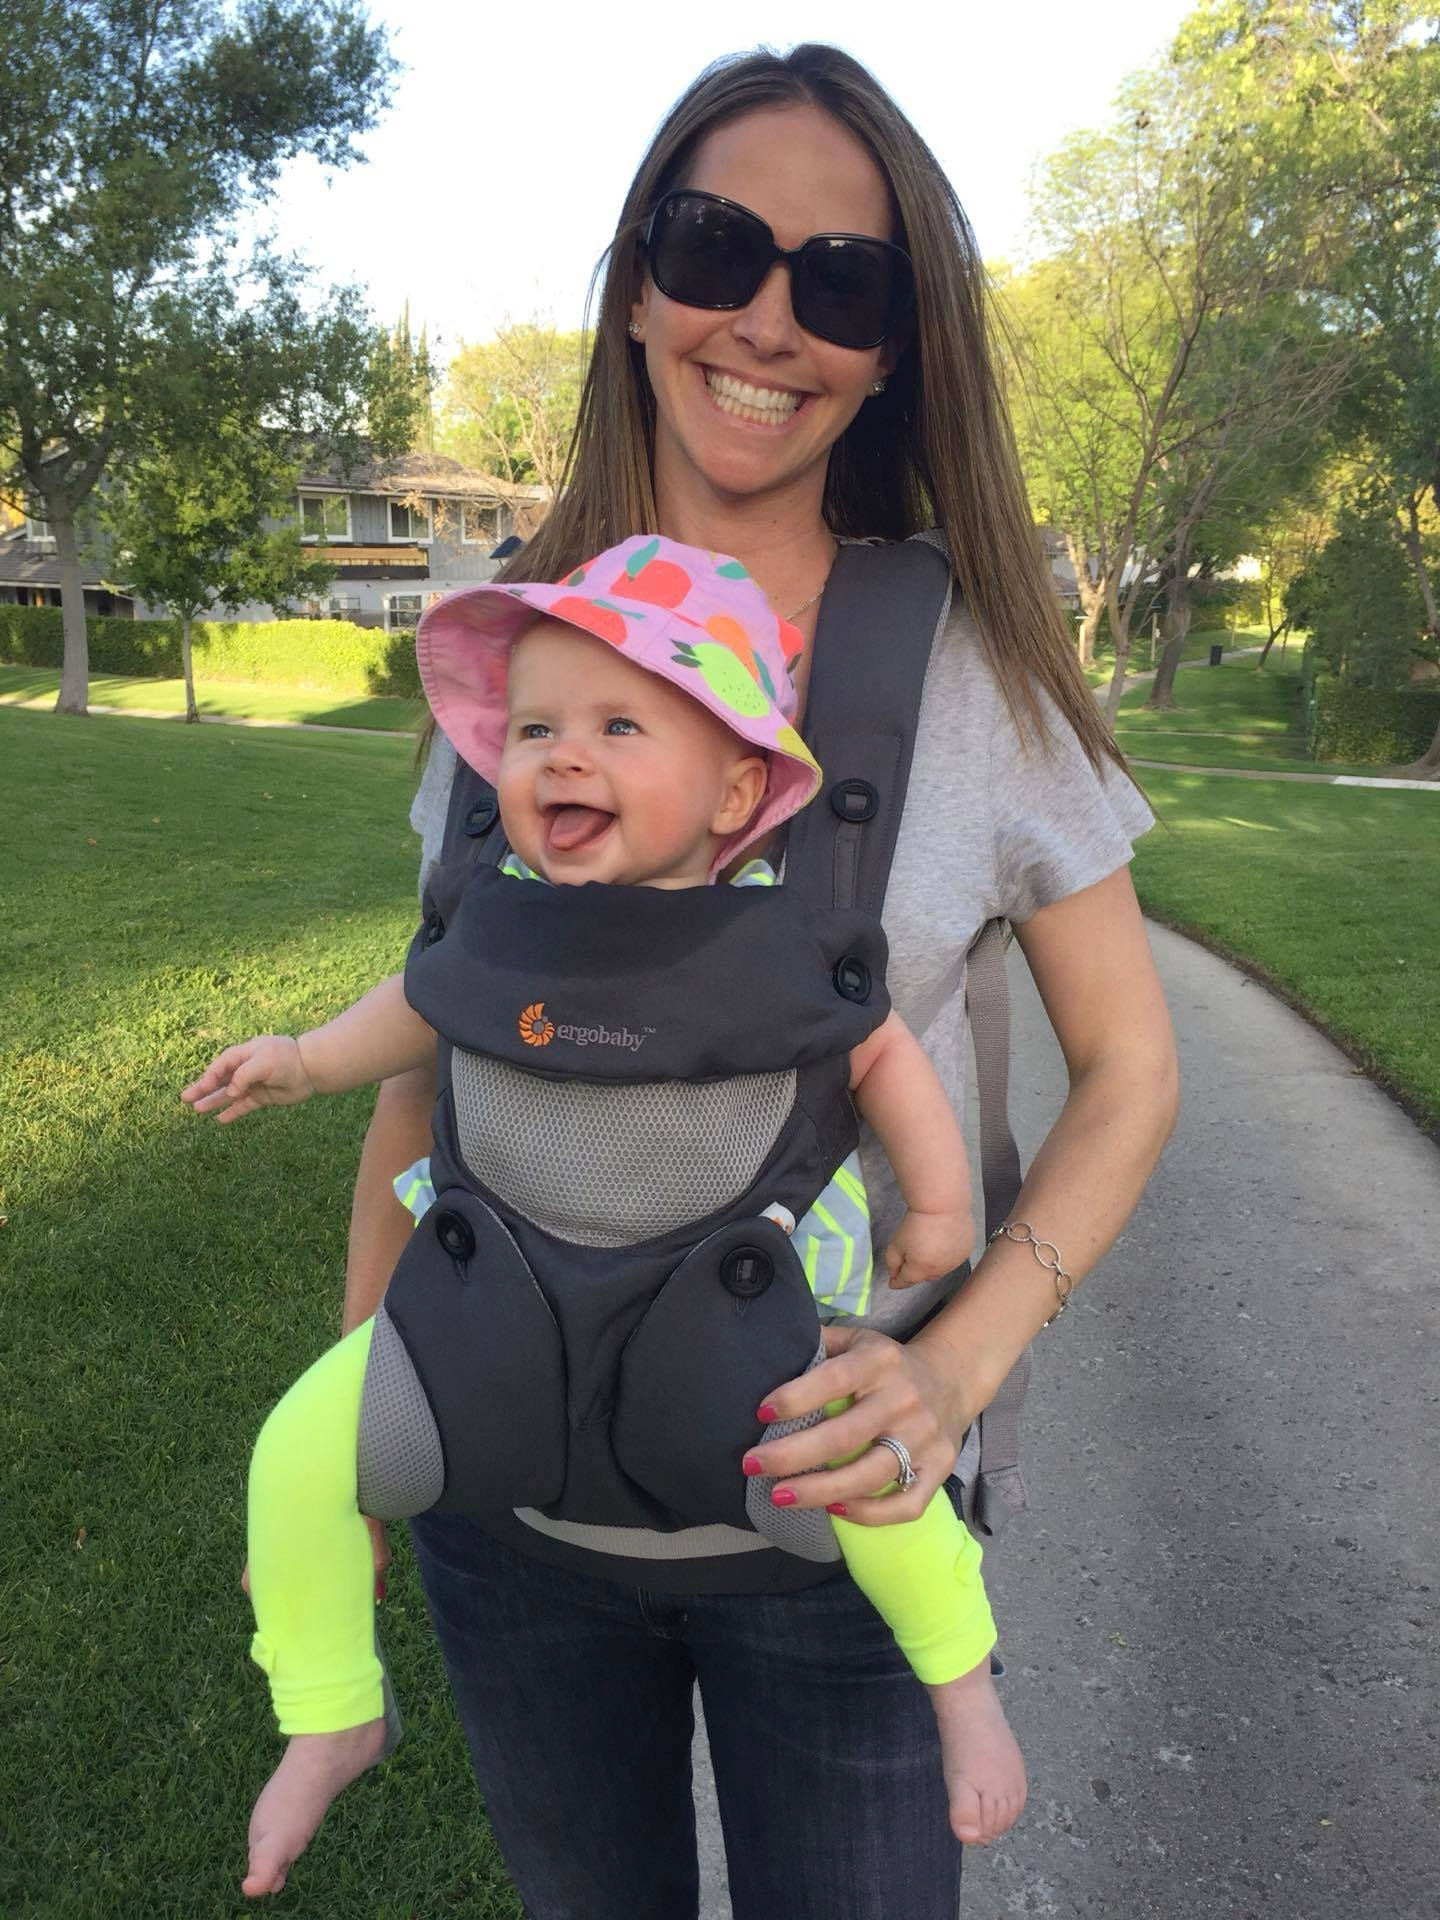 rachelle crone tara schields newborn care specialist postpartum doula thousand oaks moorpark